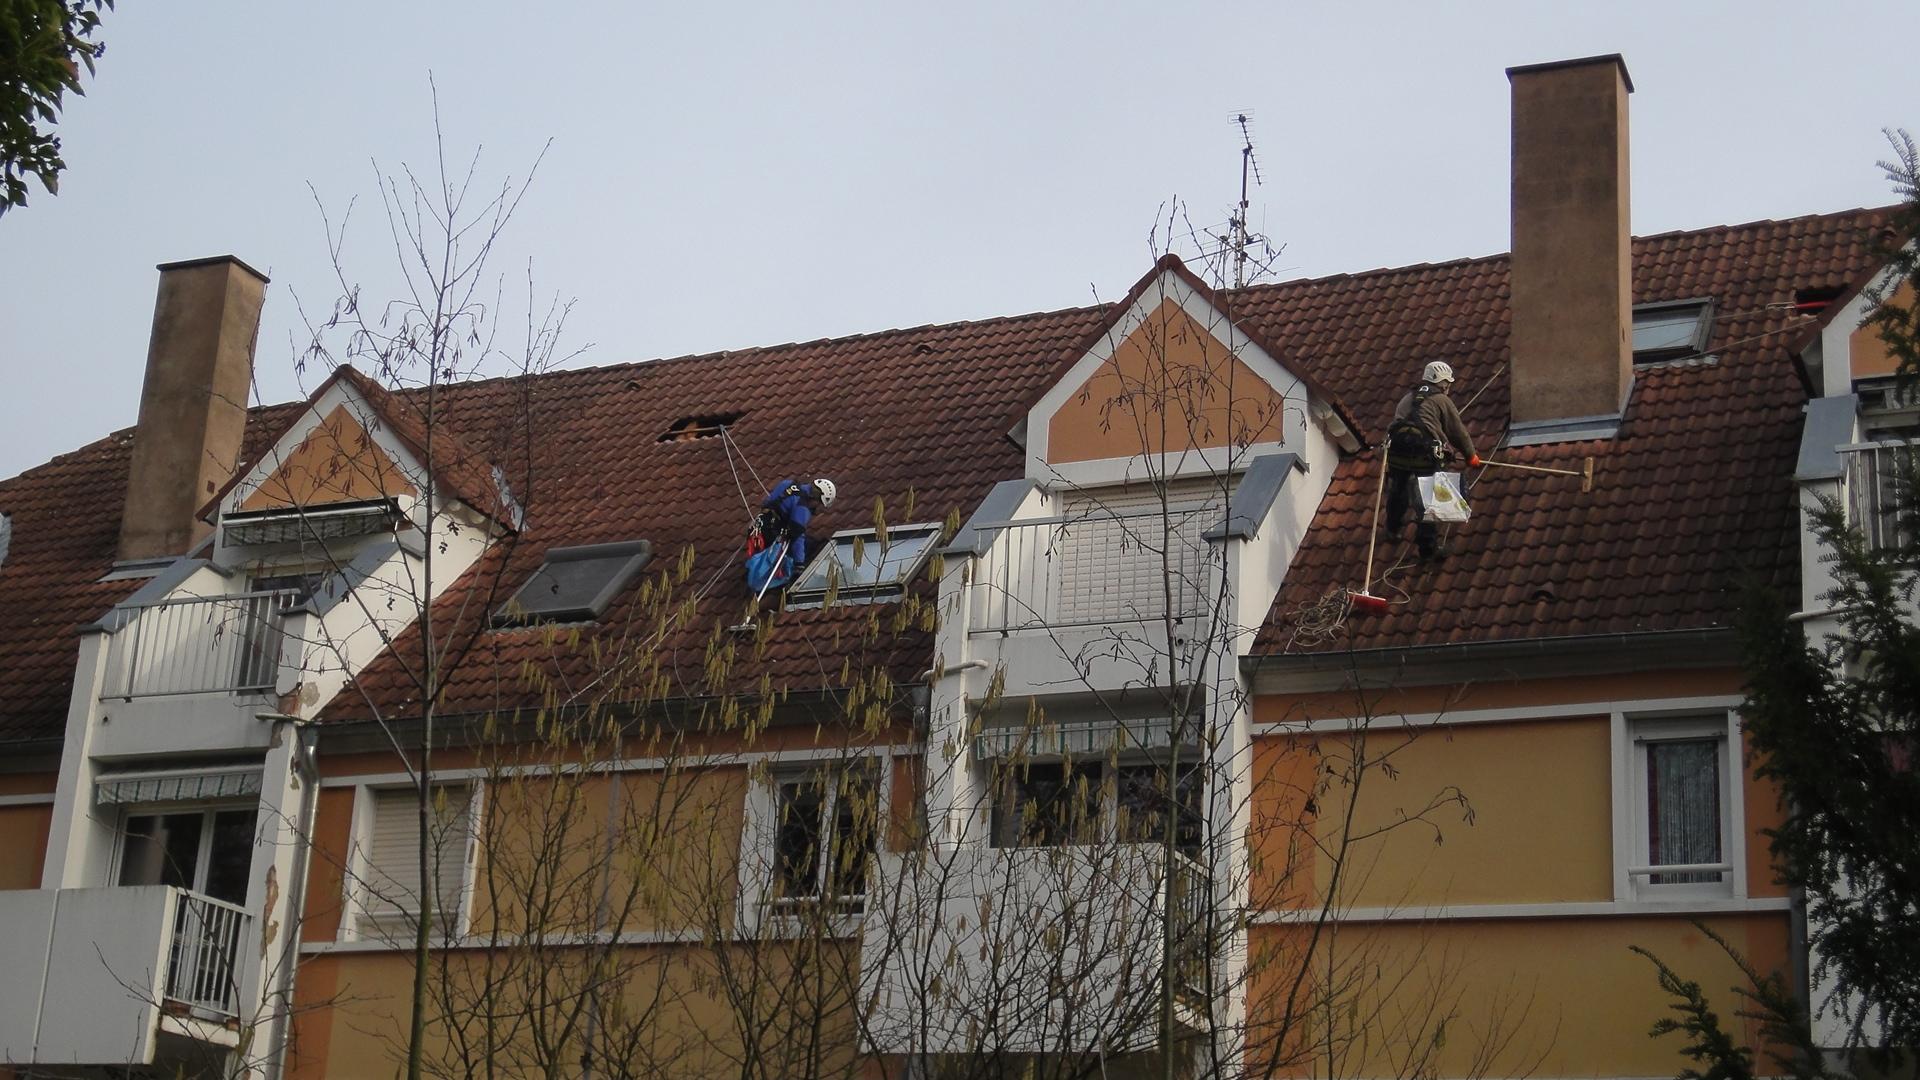 Nettoyage de toitures en Alsace - Panoramen